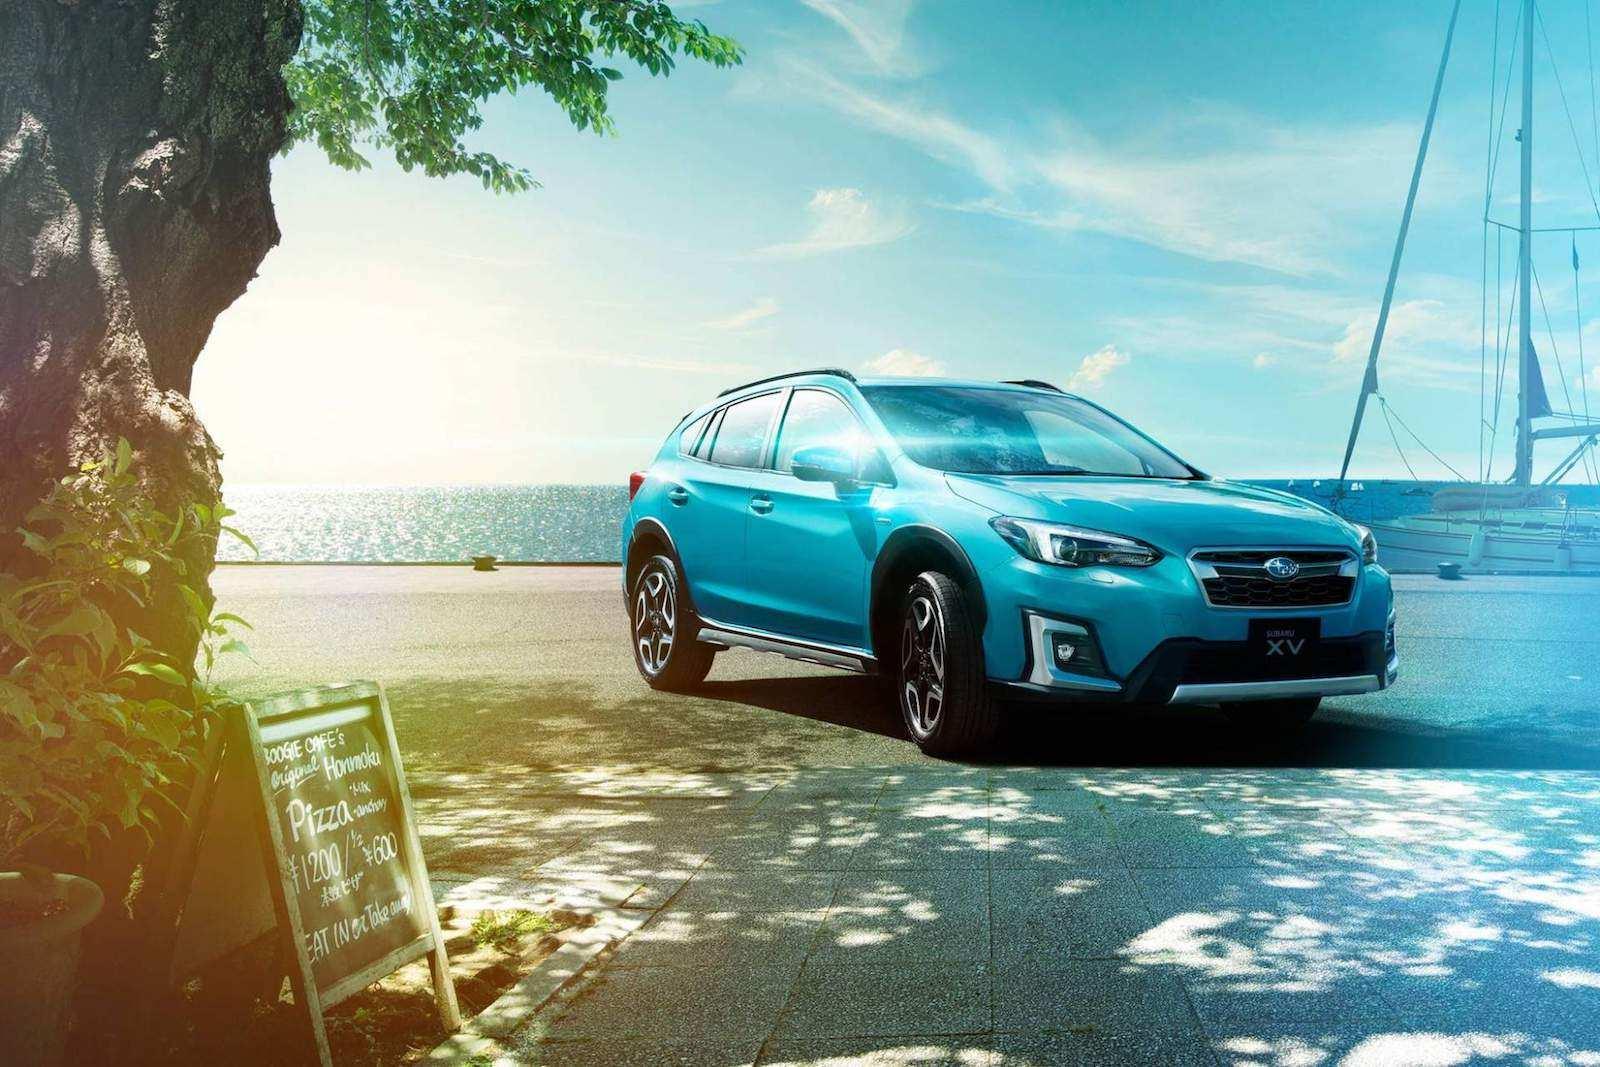 44 Gallery of The 2019 Subaru Hybrid Mpg Release Date Specs and Review by The 2019 Subaru Hybrid Mpg Release Date